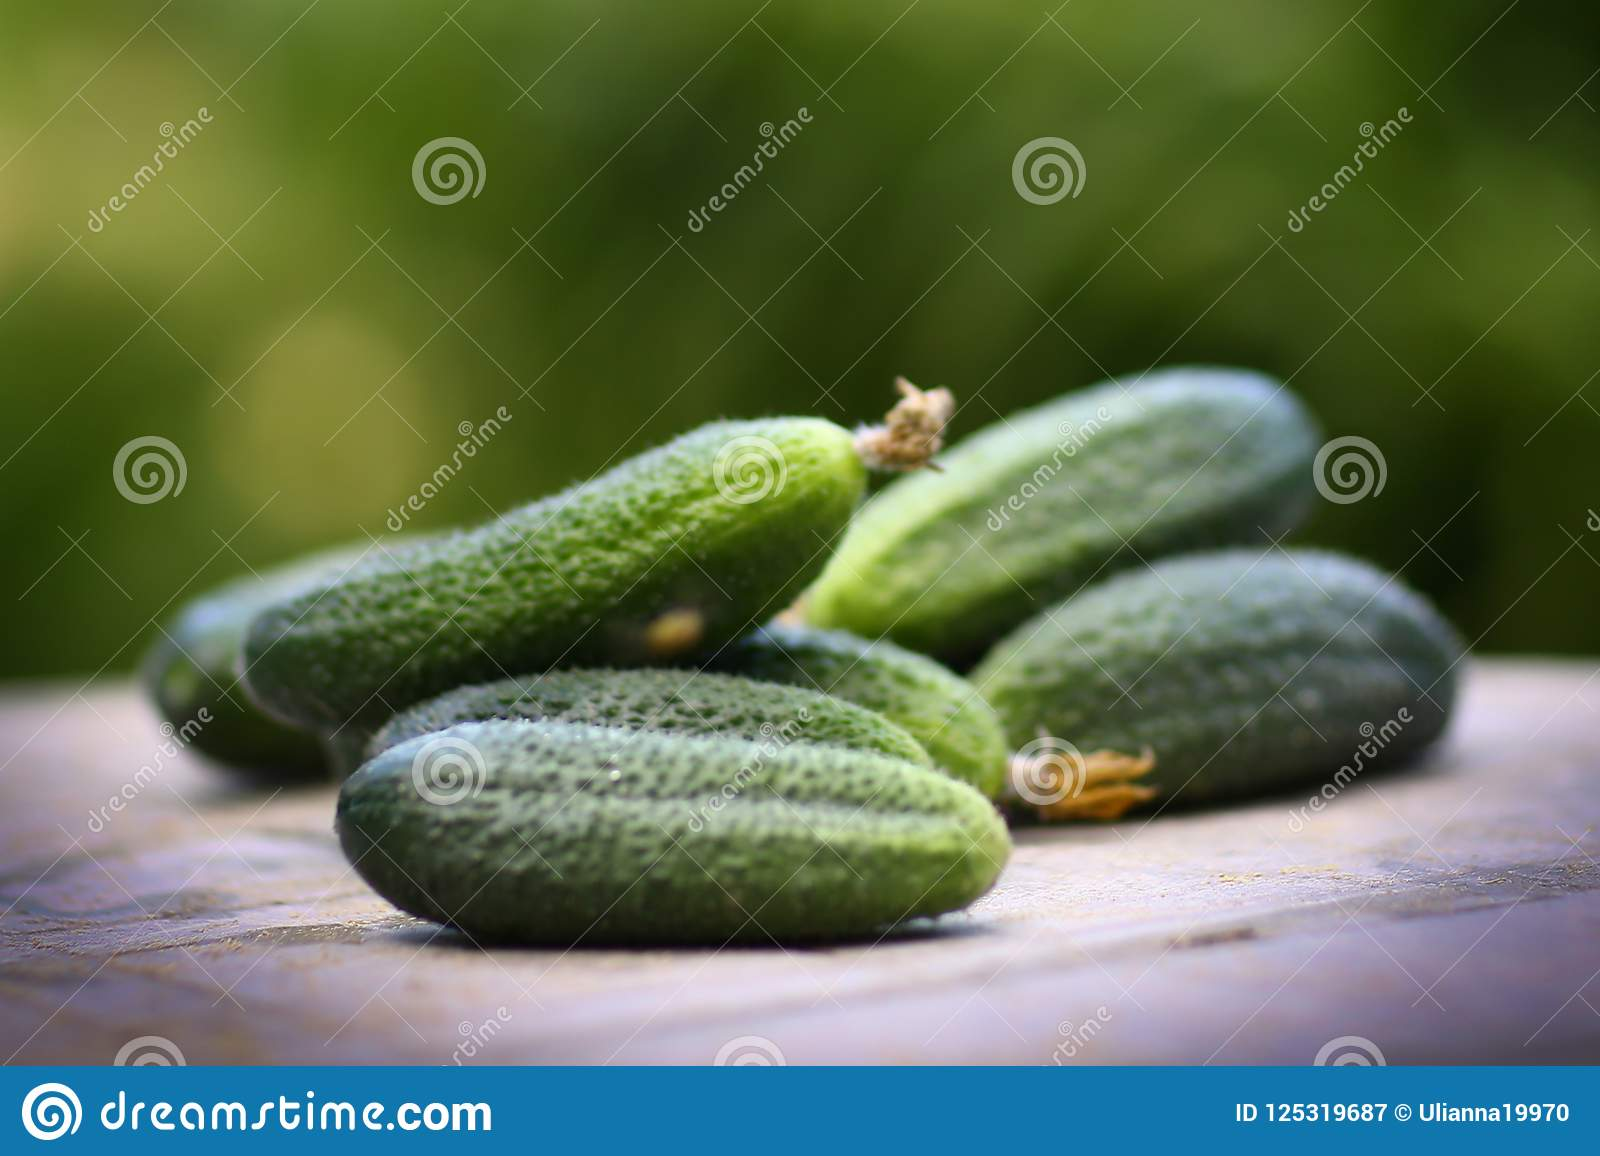 Ripe Cucumbers Close Up Horizontal Photo Stock Image Image Of